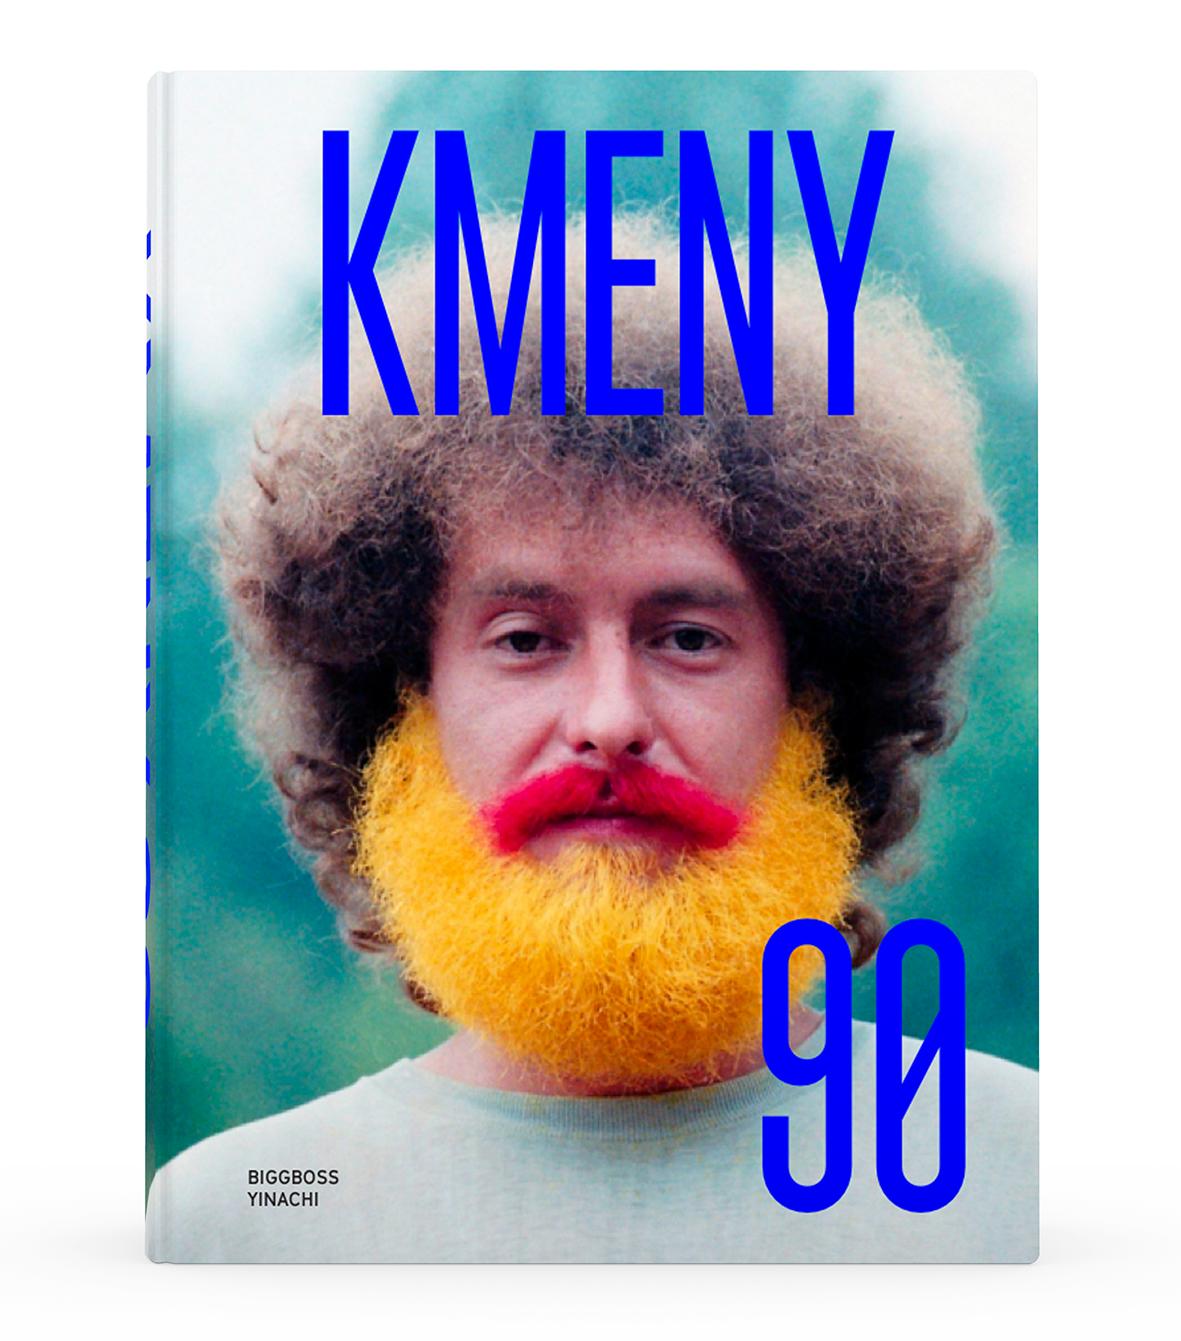 Vladimir 518, Kmeny 90